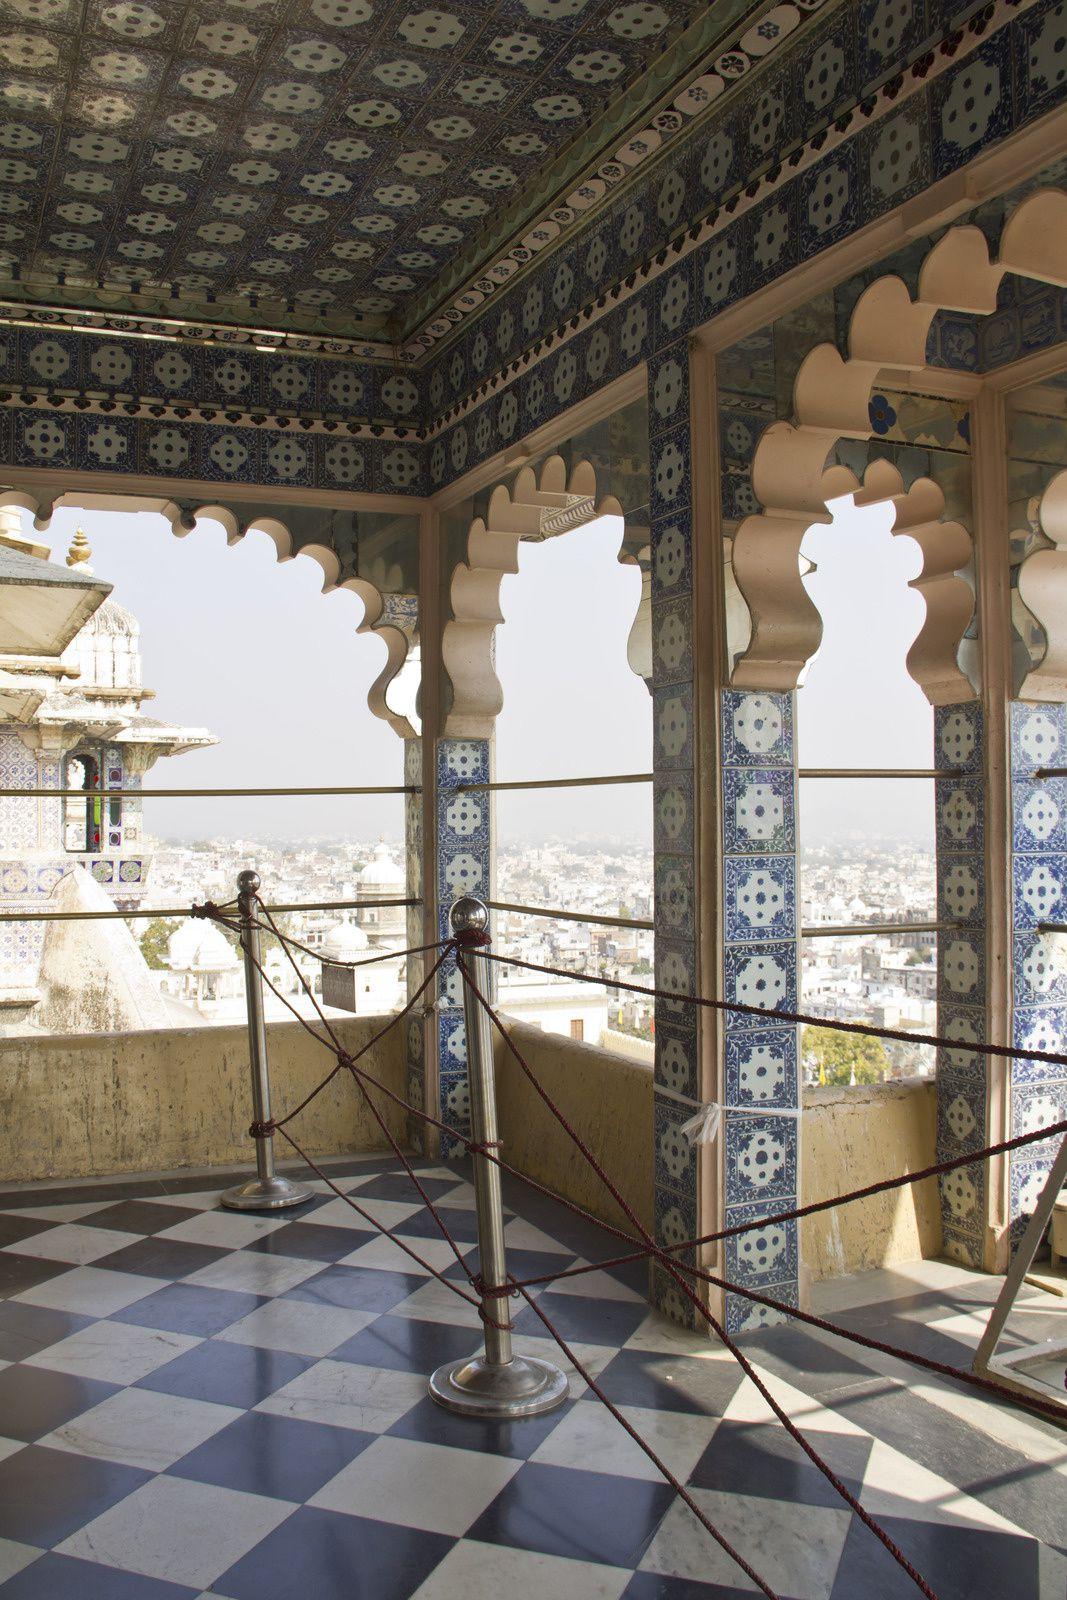 Vues du Chini-ki-Chita Mahal.